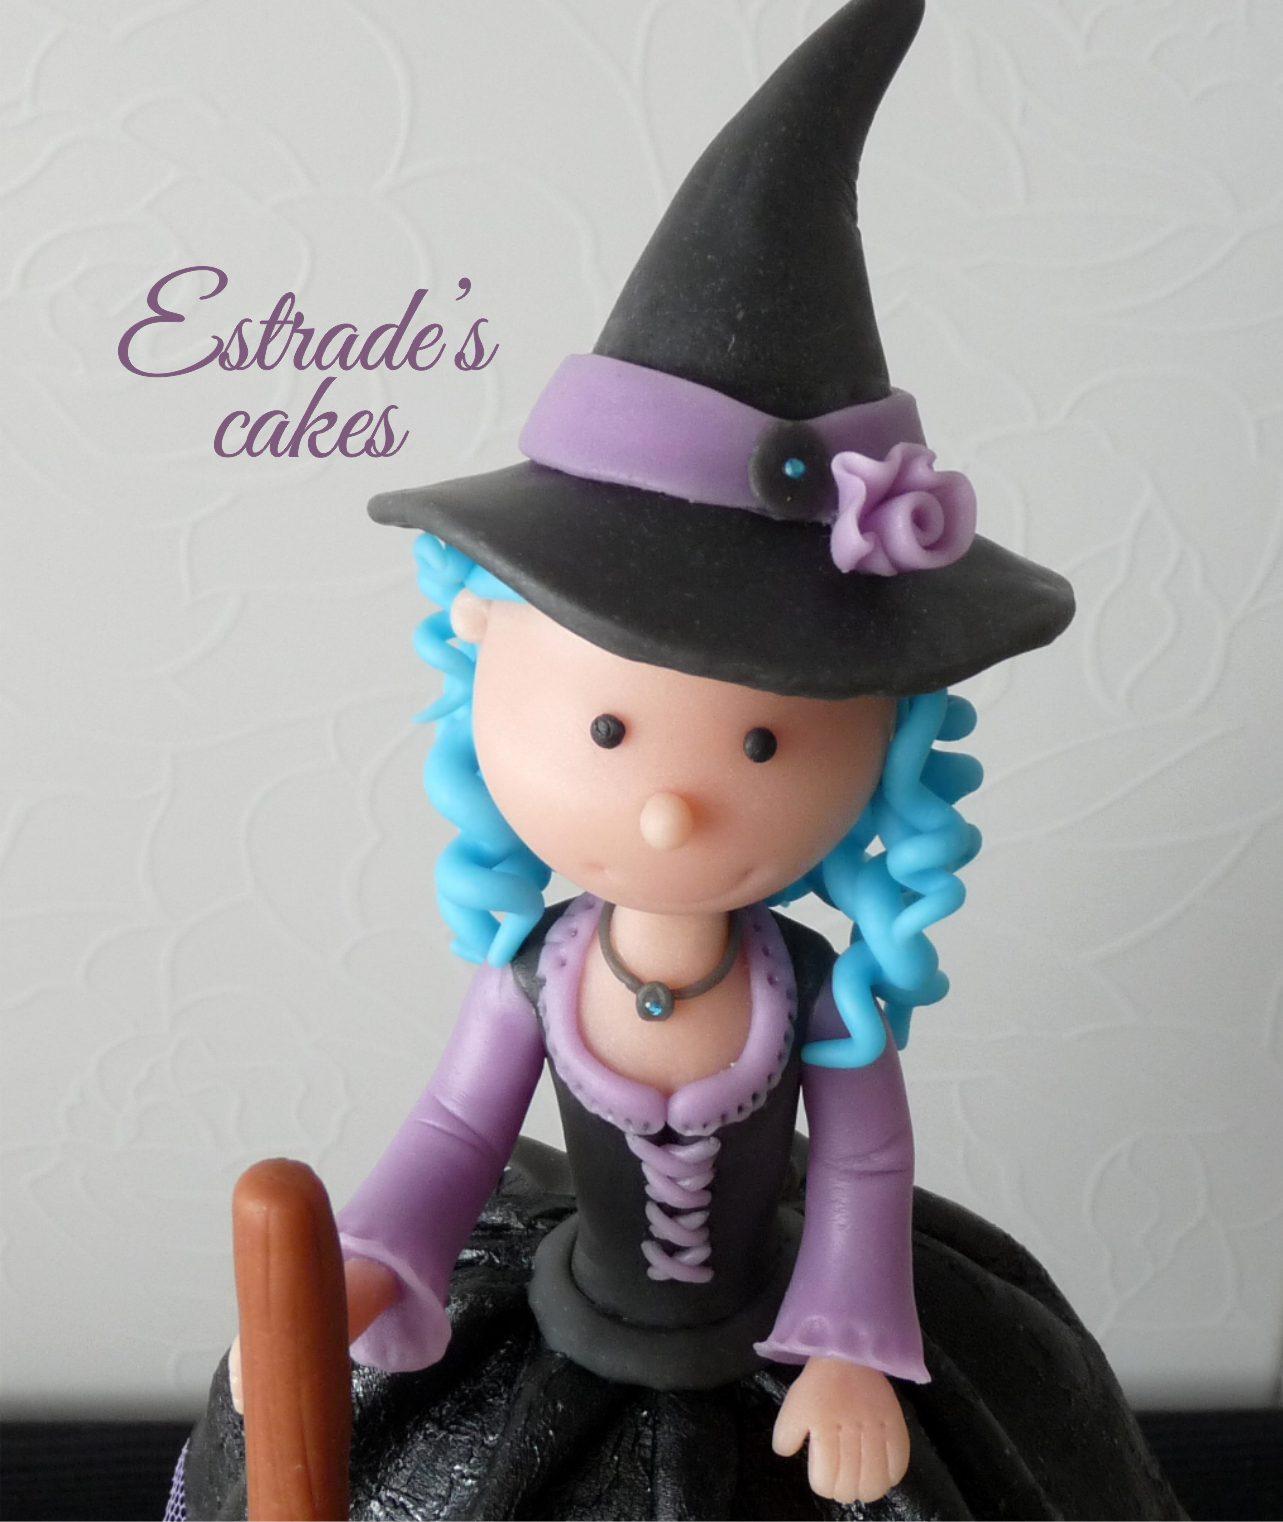 muñeca alta de brujita en porcelana fría - 2